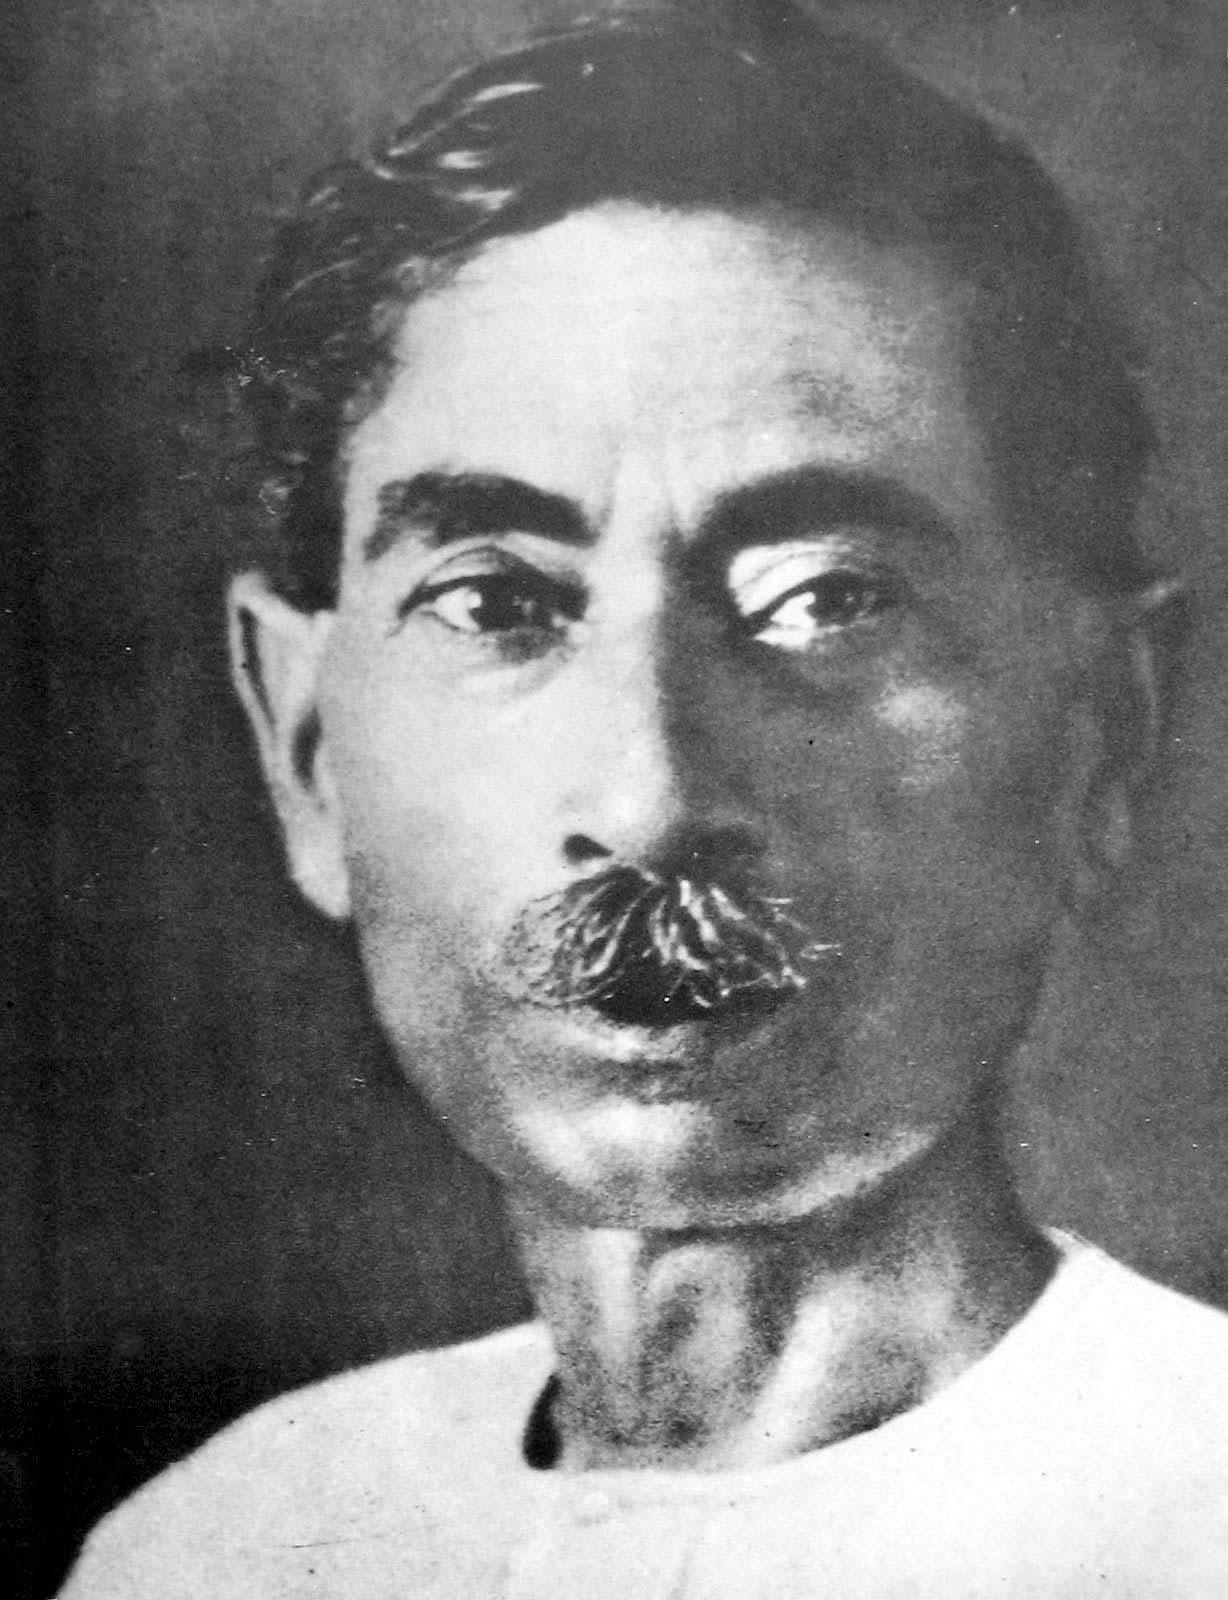 Classical journalist Premchand